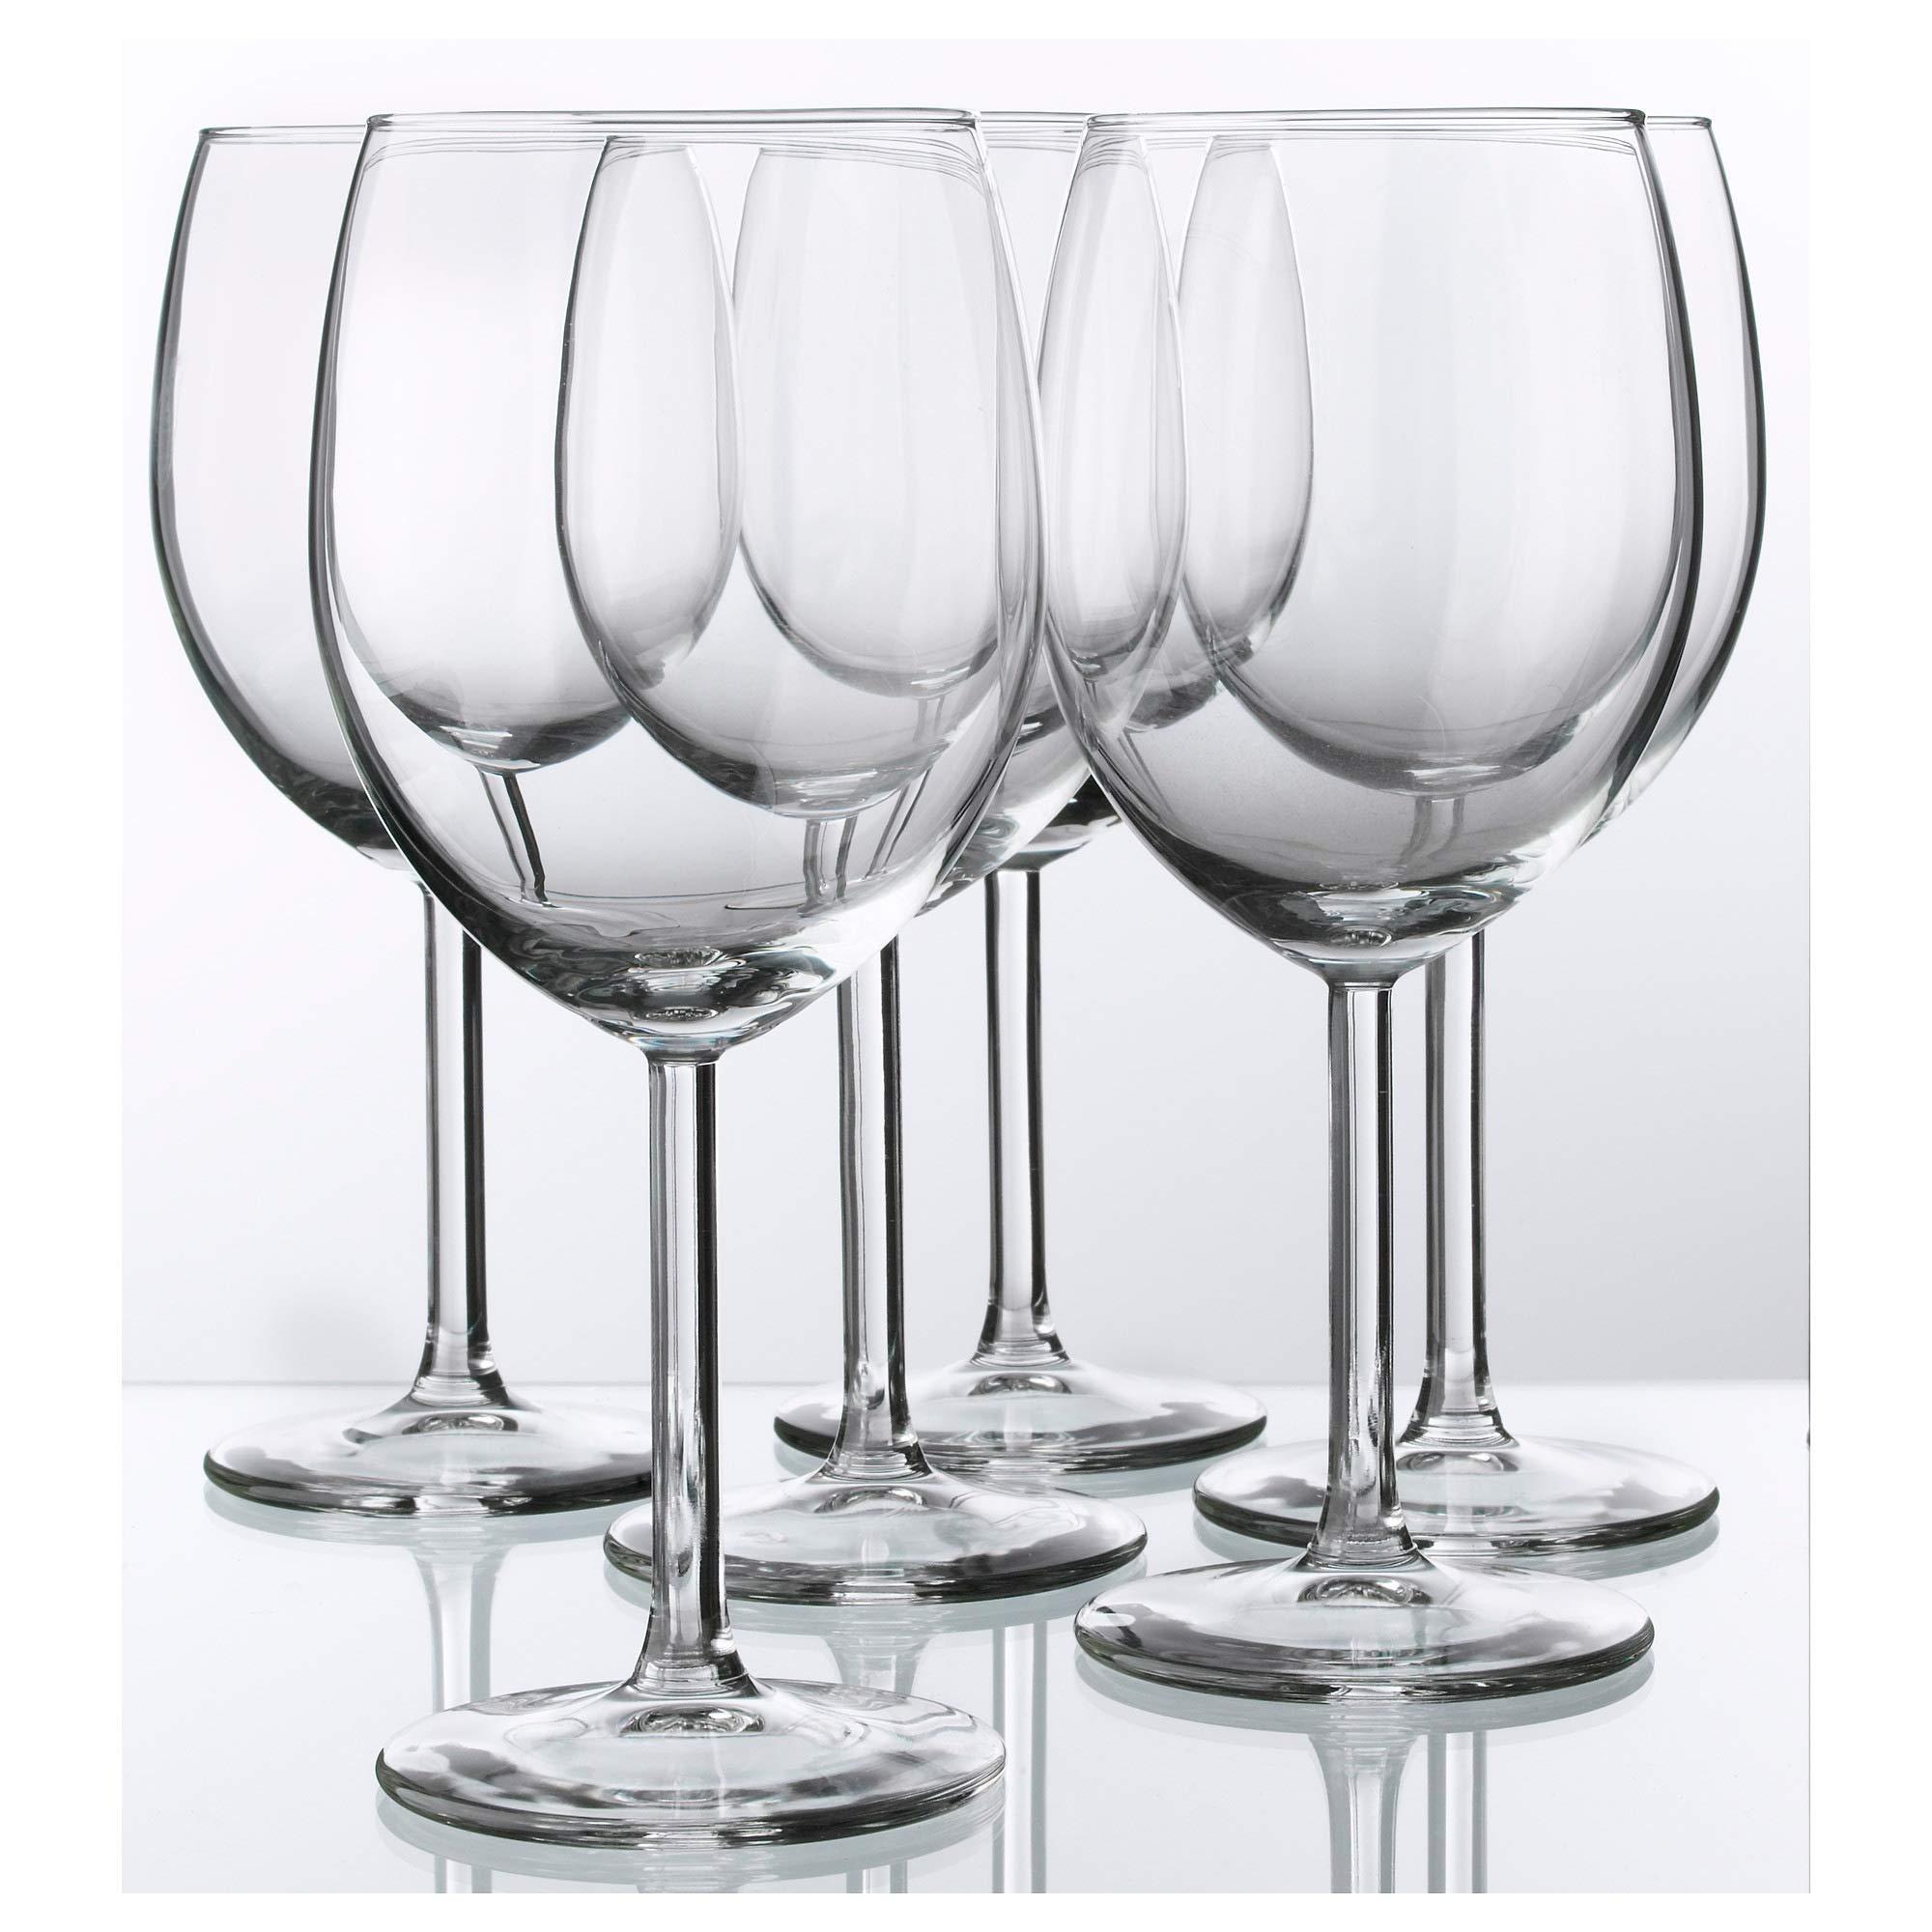 Red Wine Glass By Ikea- Svalka Series SET OF 6, 10 0Z by IKEA